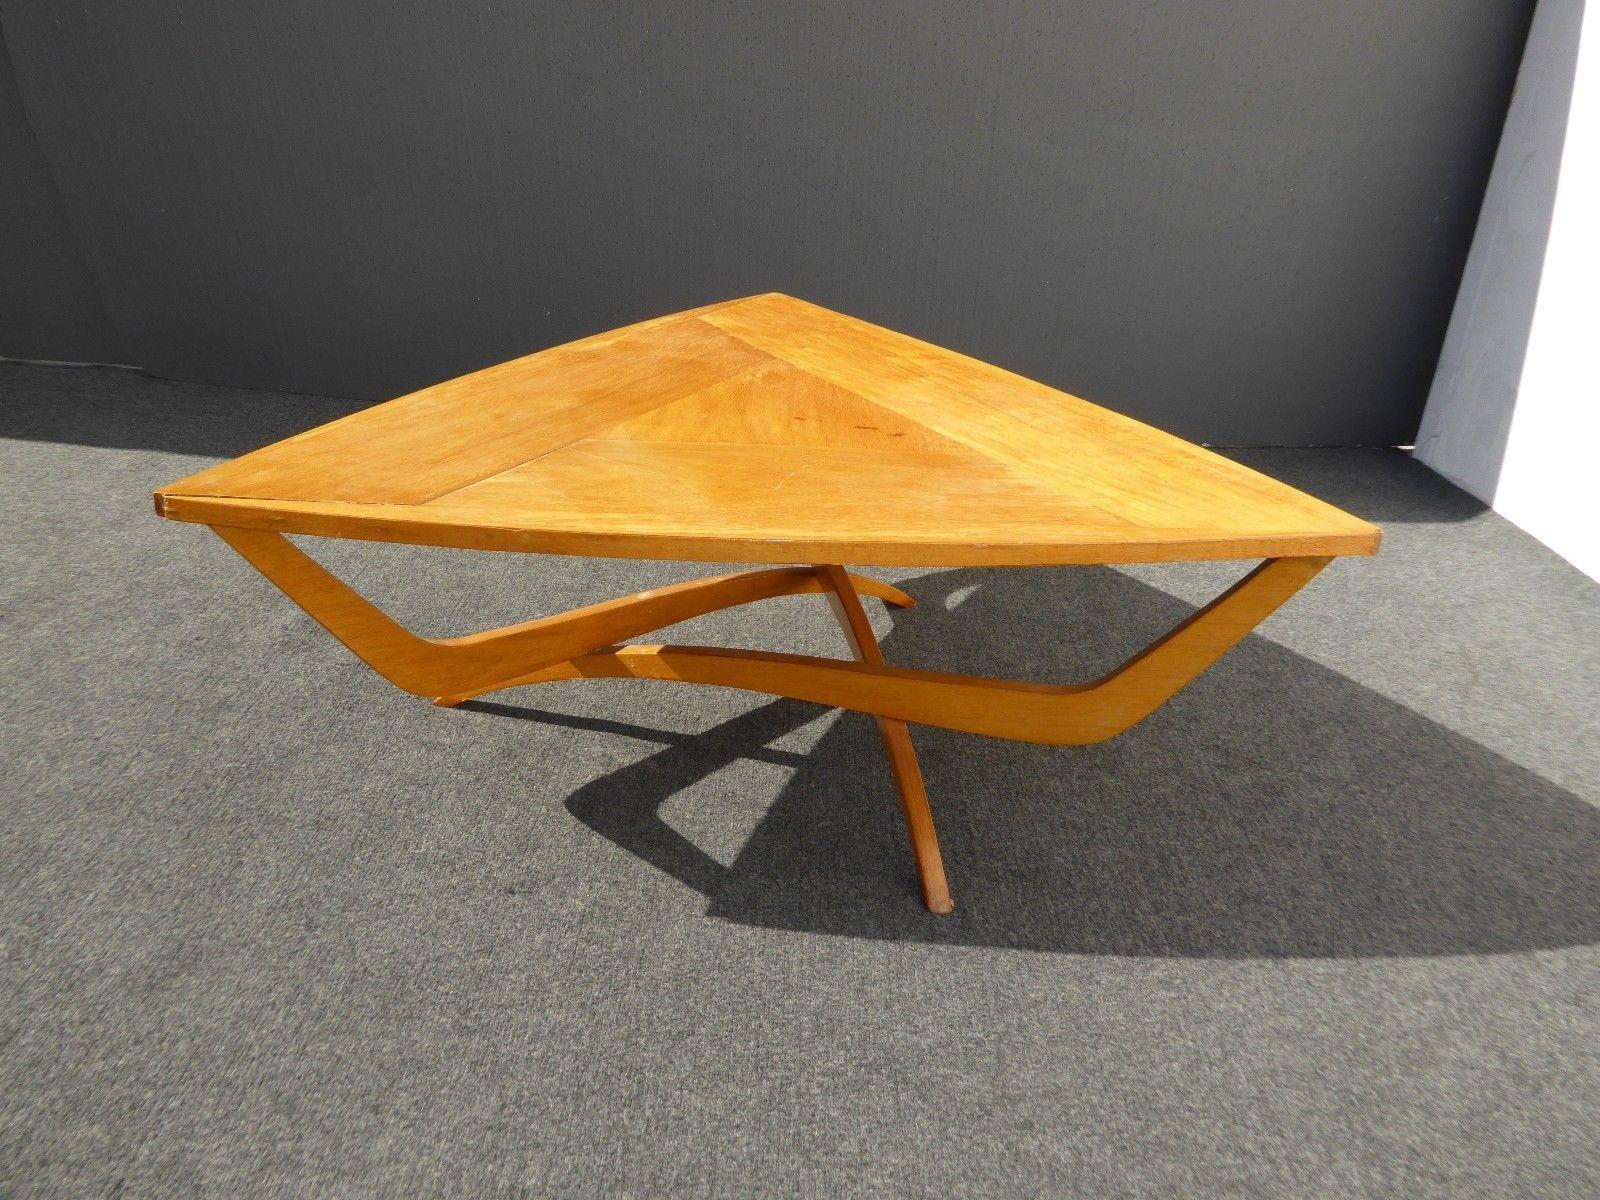 Unique Vintage Danish Modern Art Deco Style Solid Wood Triangle Coffee Table Danish Modern Coffee Table Furniture Coffee Table [ 1200 x 1600 Pixel ]